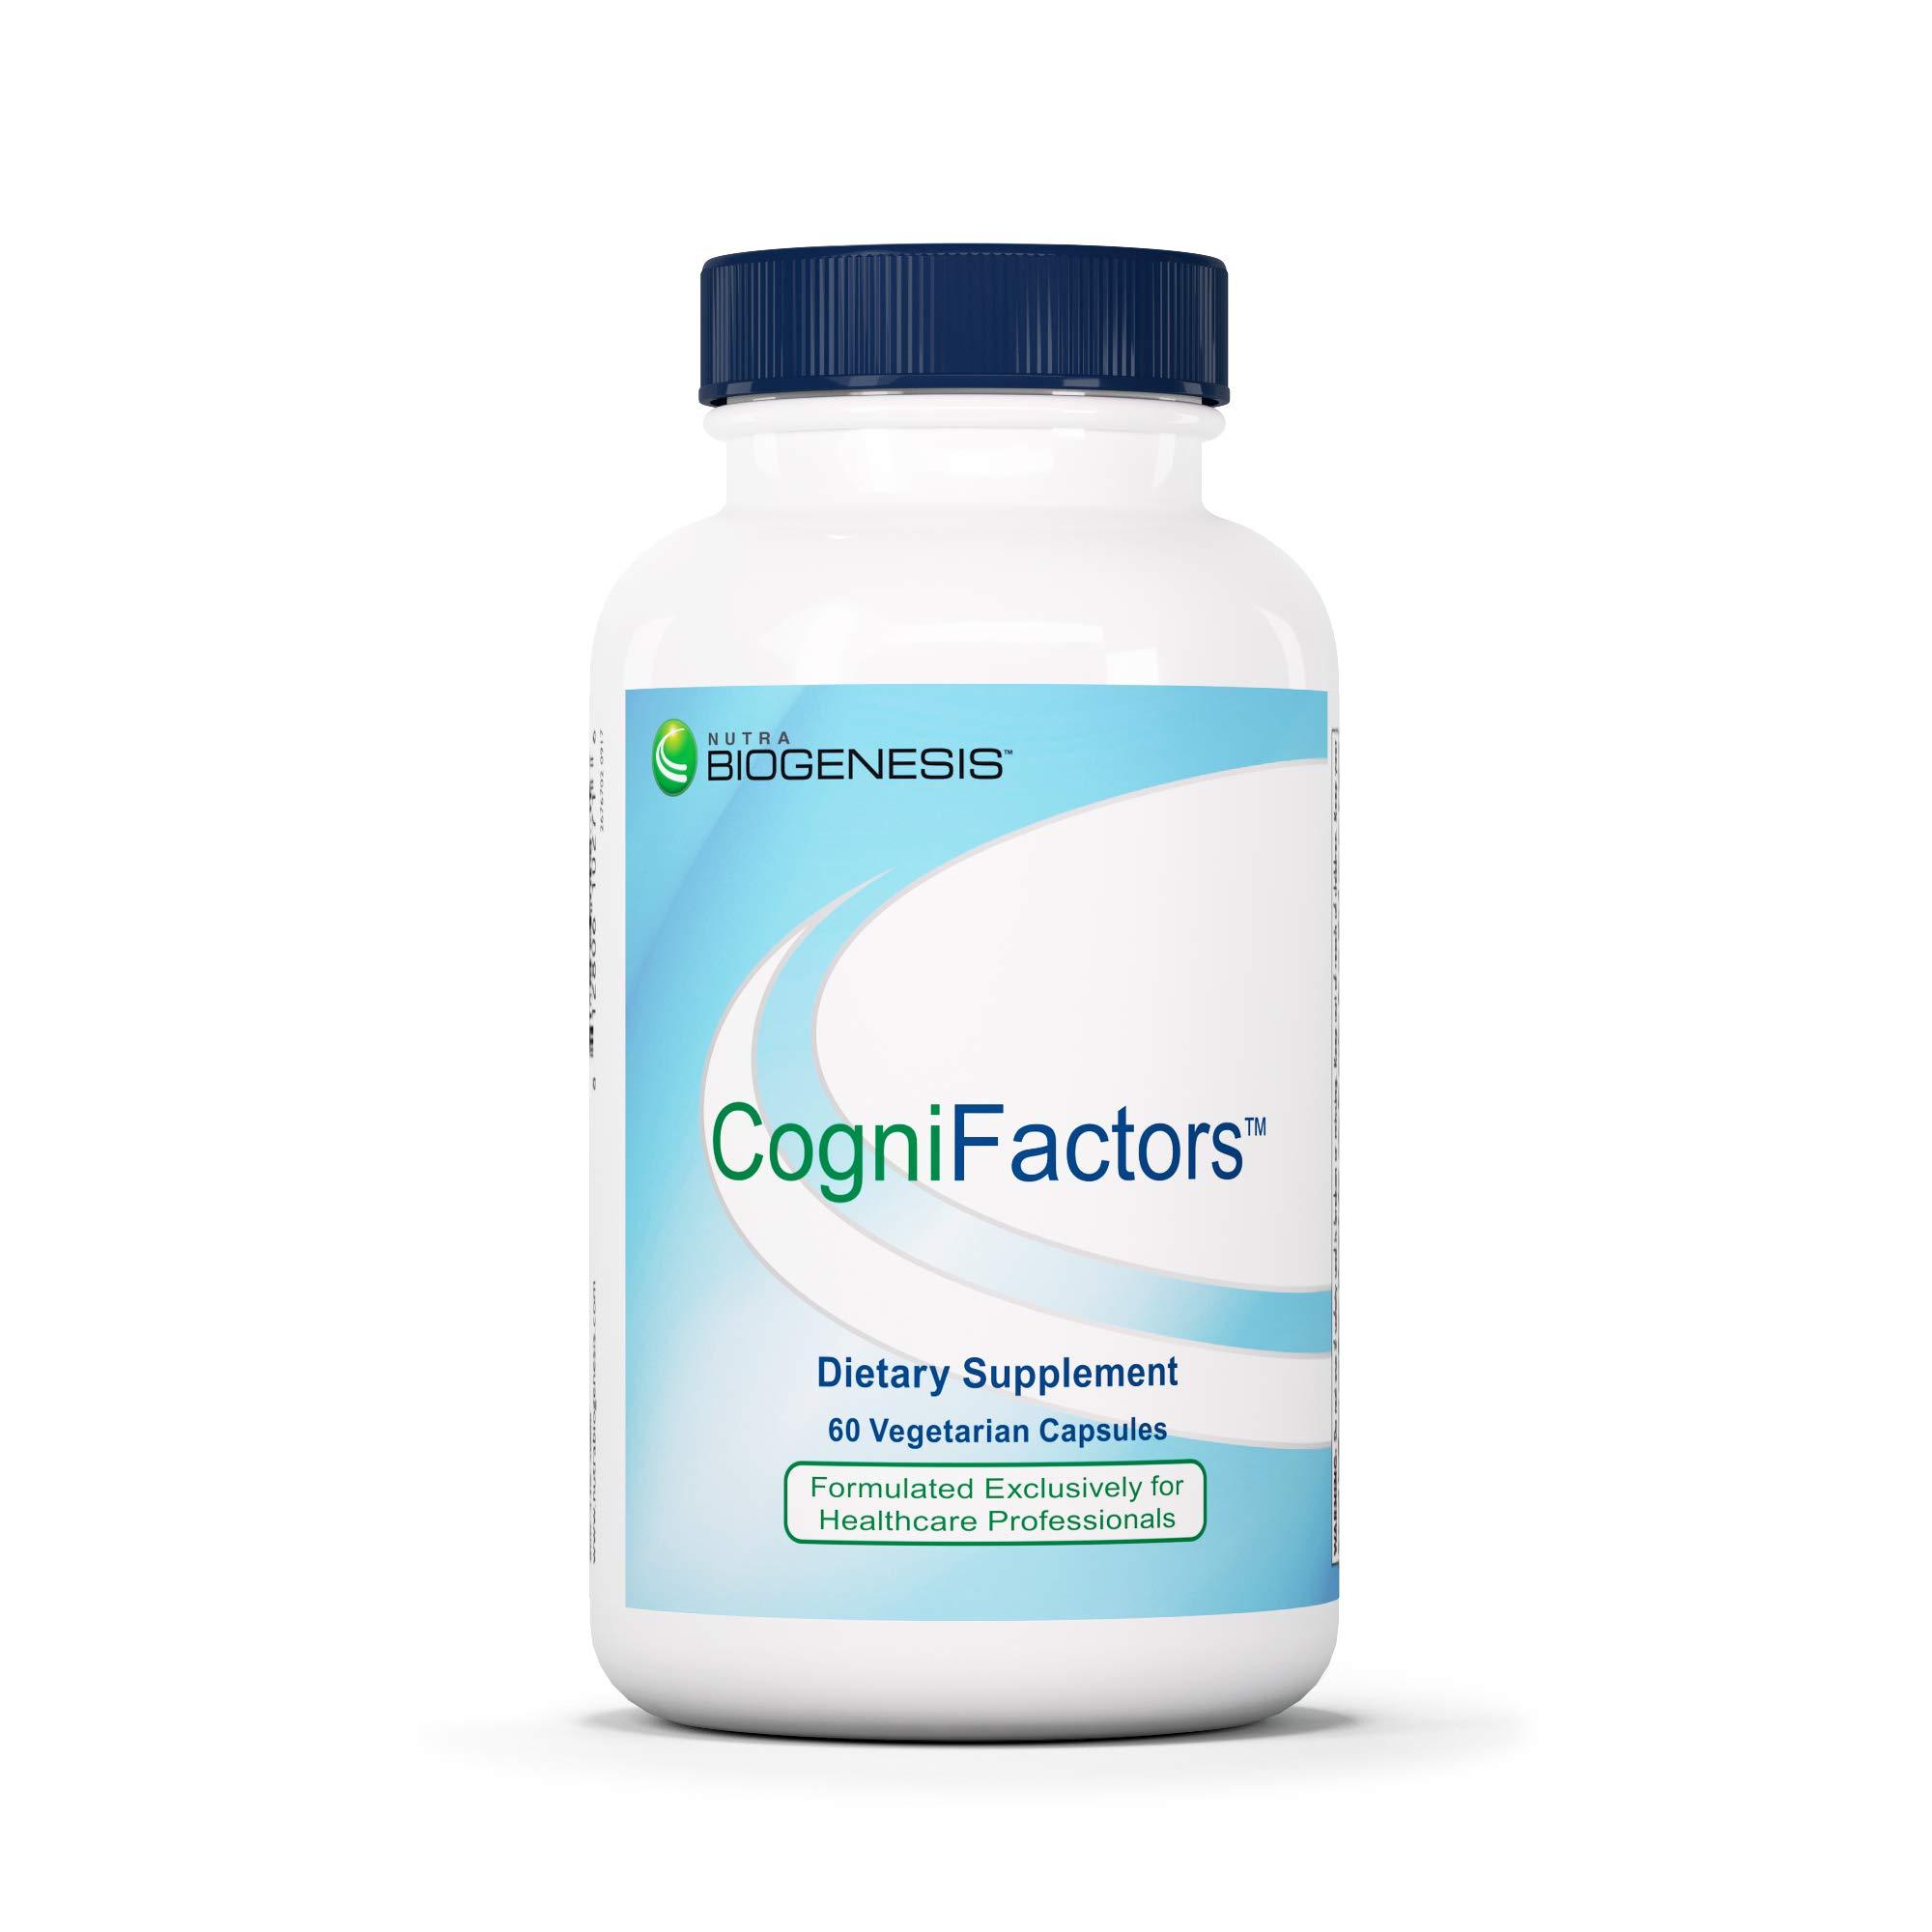 Nutra BioGenesis CogniFactors - Ginkgo Biloba, Phosphatidylserine and DMAE to Help Support Cognitive Function, Memory and Focus - Gluten Free, Vegan, Non-GMO - 60 Capsules